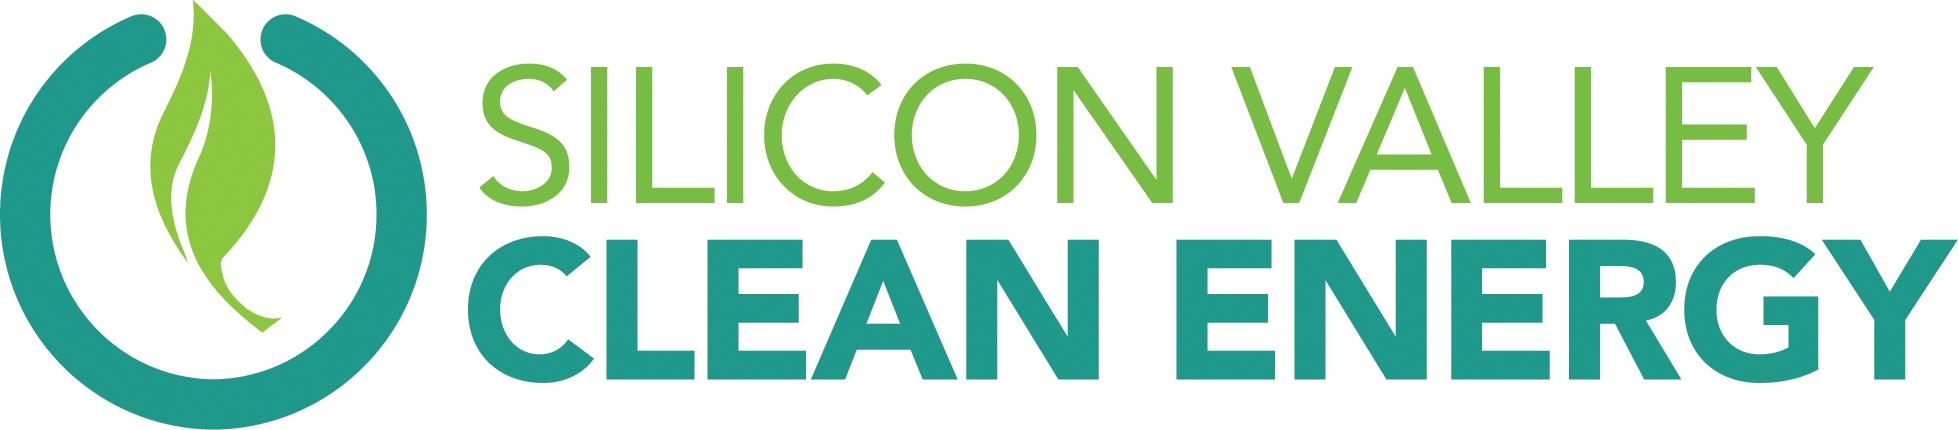 silicon valley clean energy logo